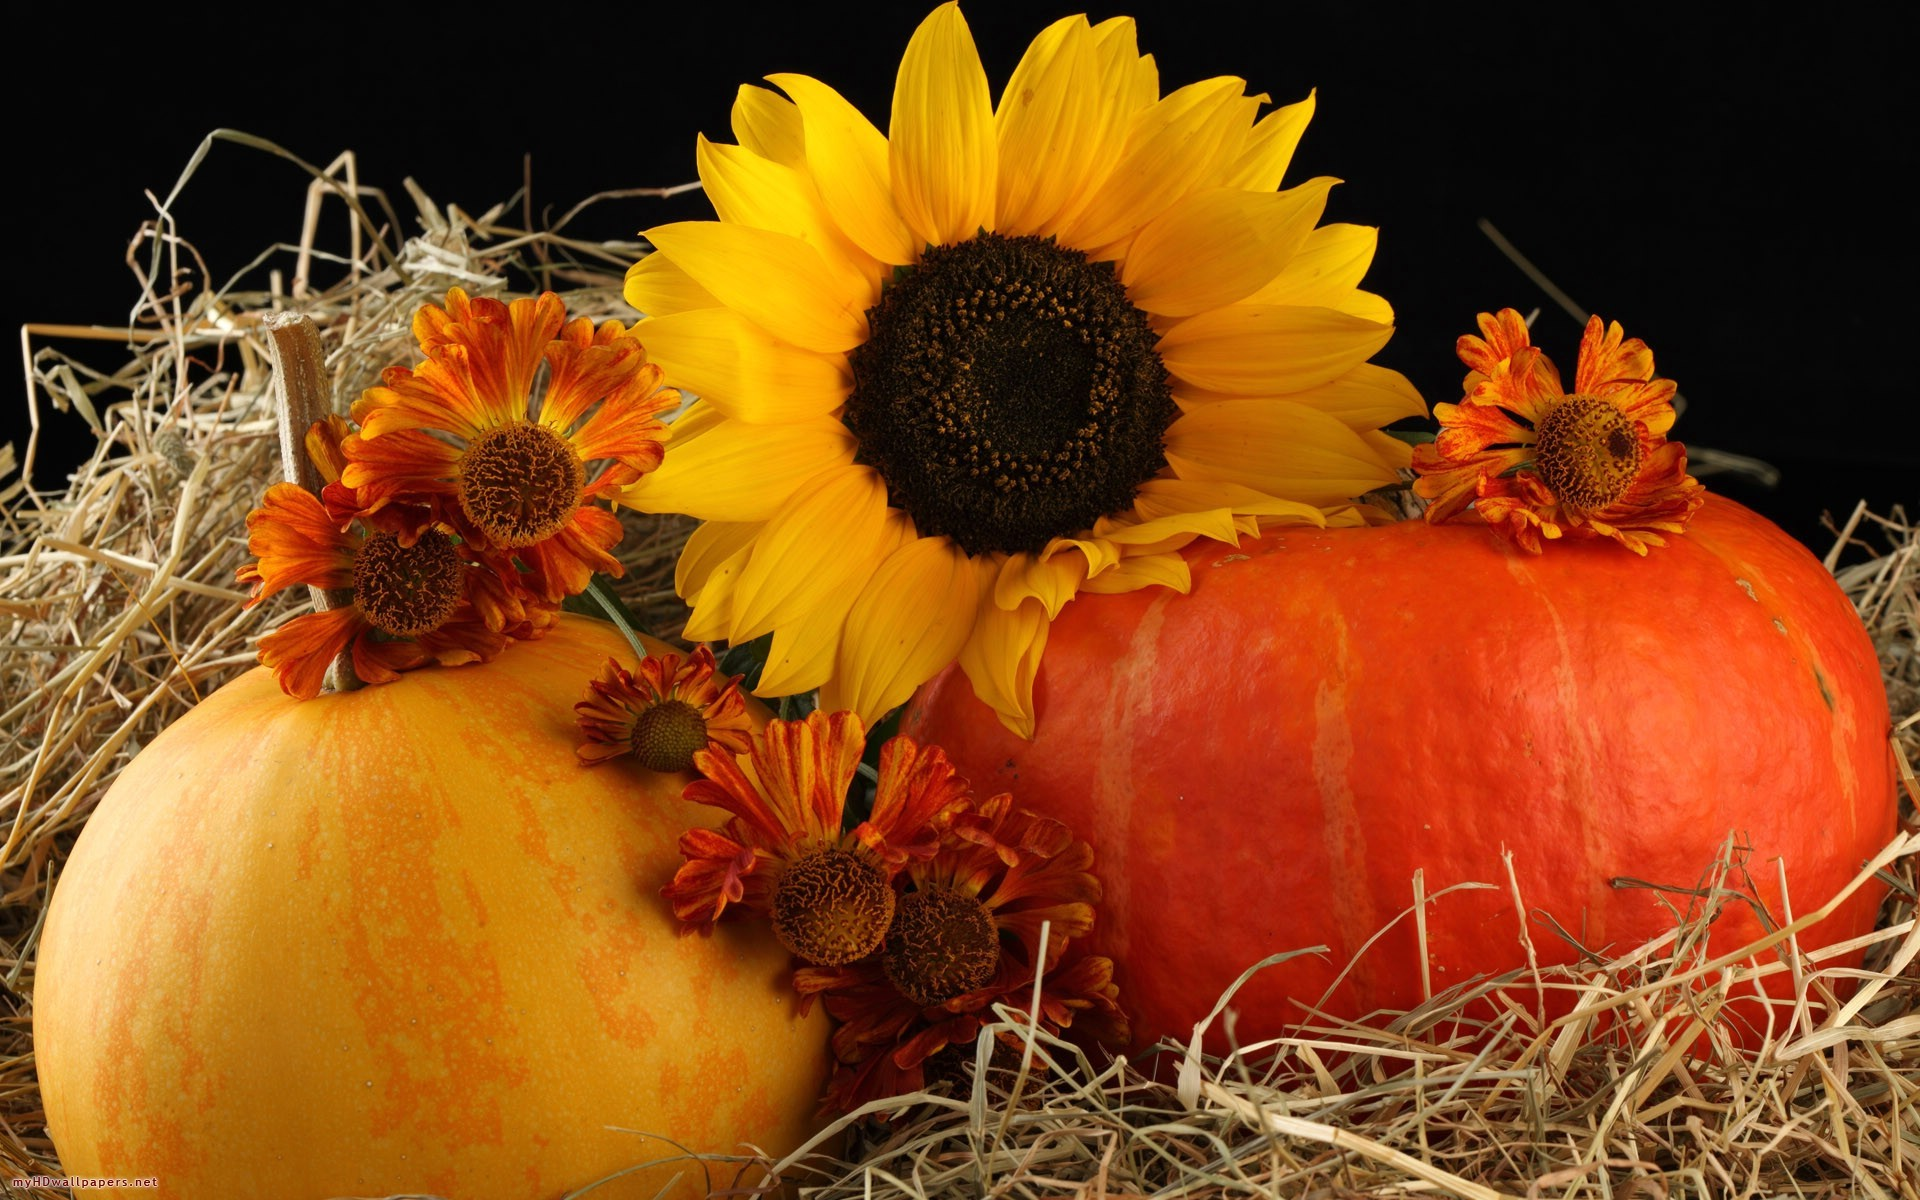 Autumn Pumpkins Desktop Wallpaper (50+ images)